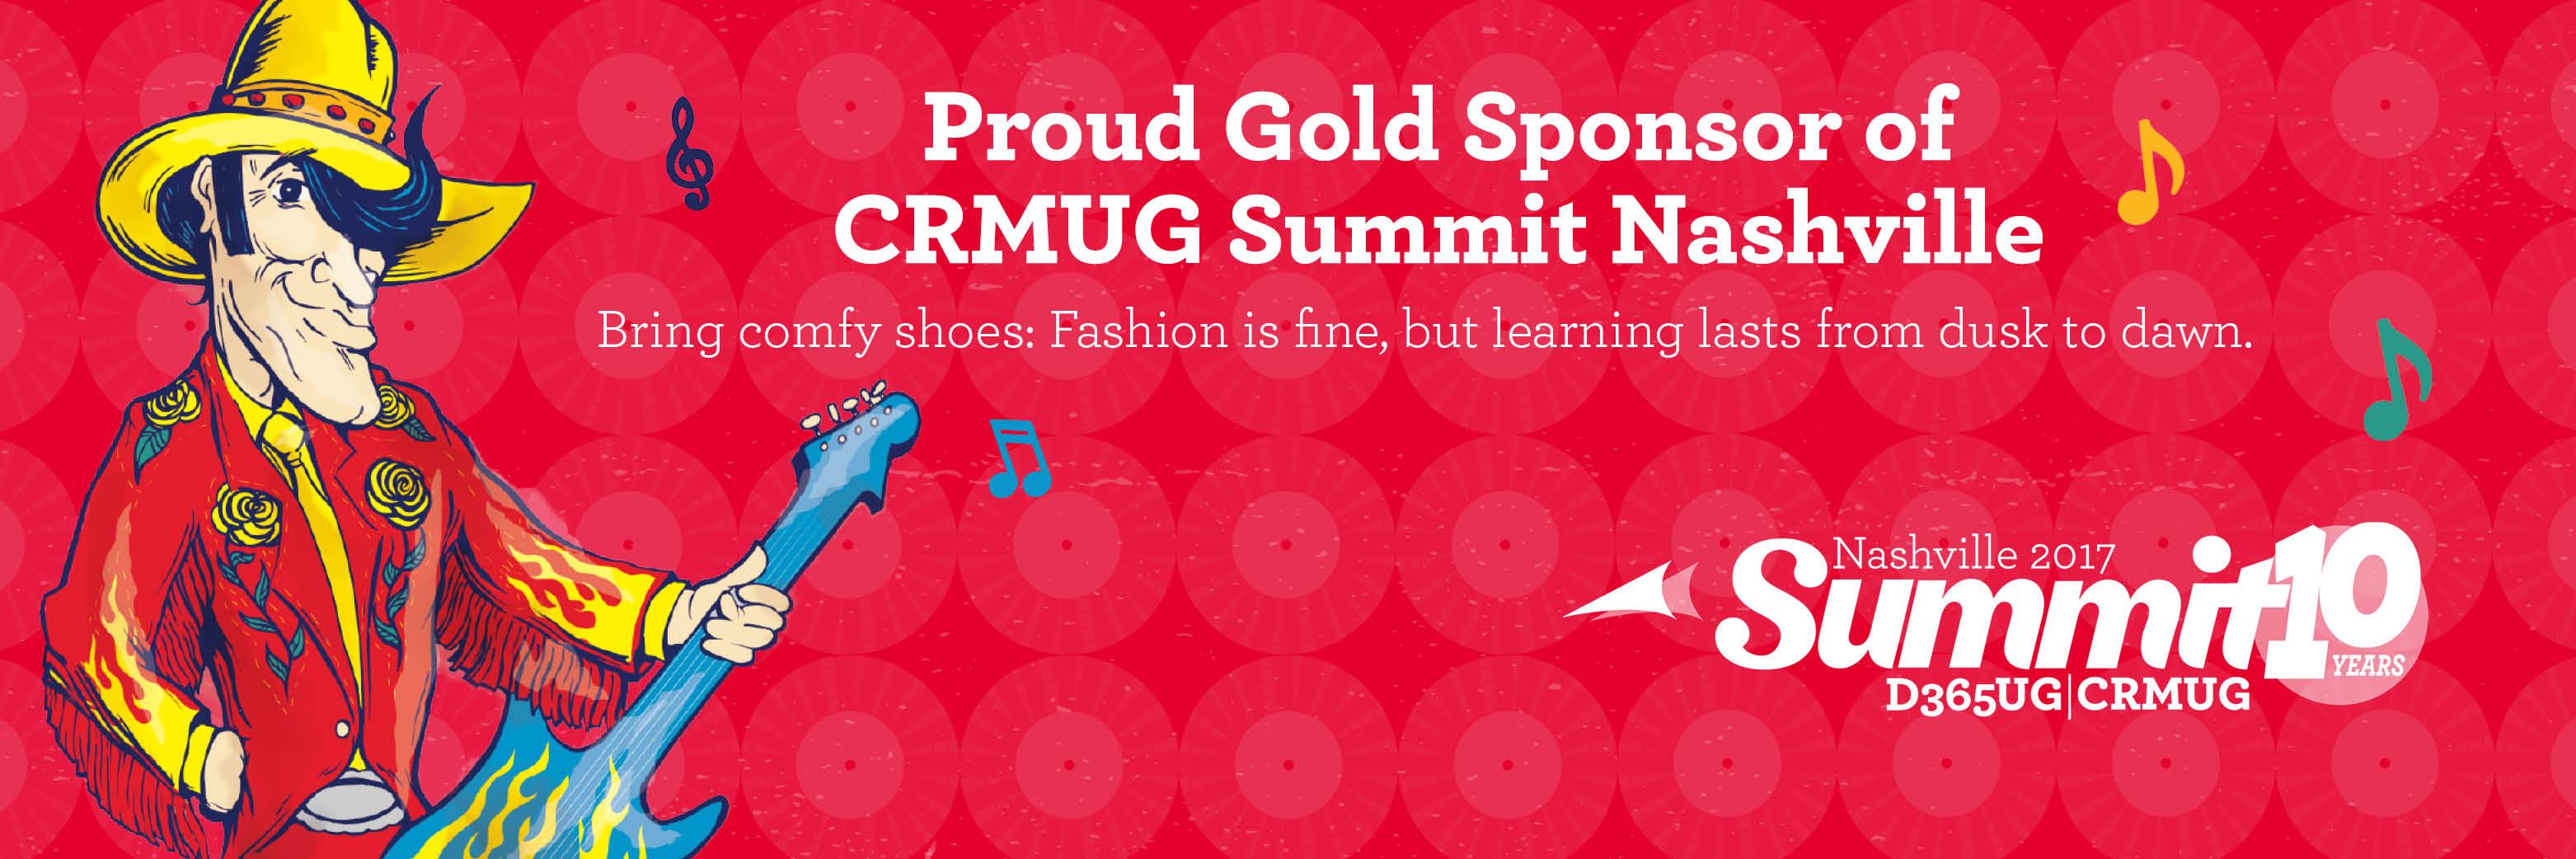 CRMUG Summit Nashville 2017